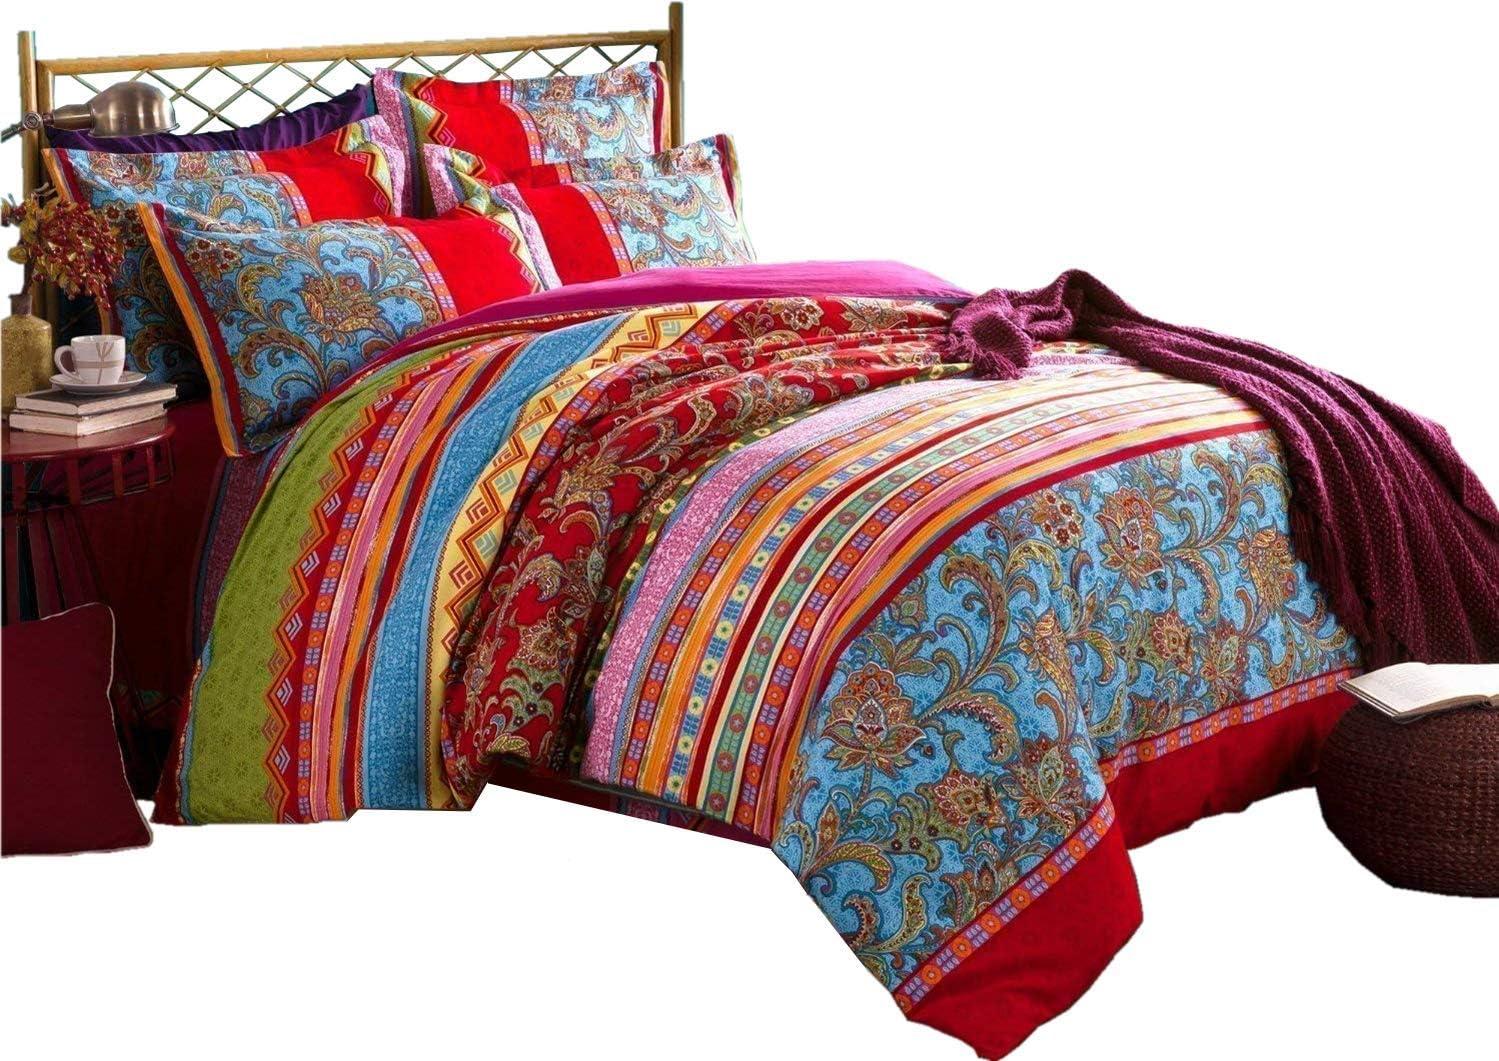 LELVA Bohemian Bedding Chic Boho Duvet Sheet Cover with Set Flat shop Easy-to-use